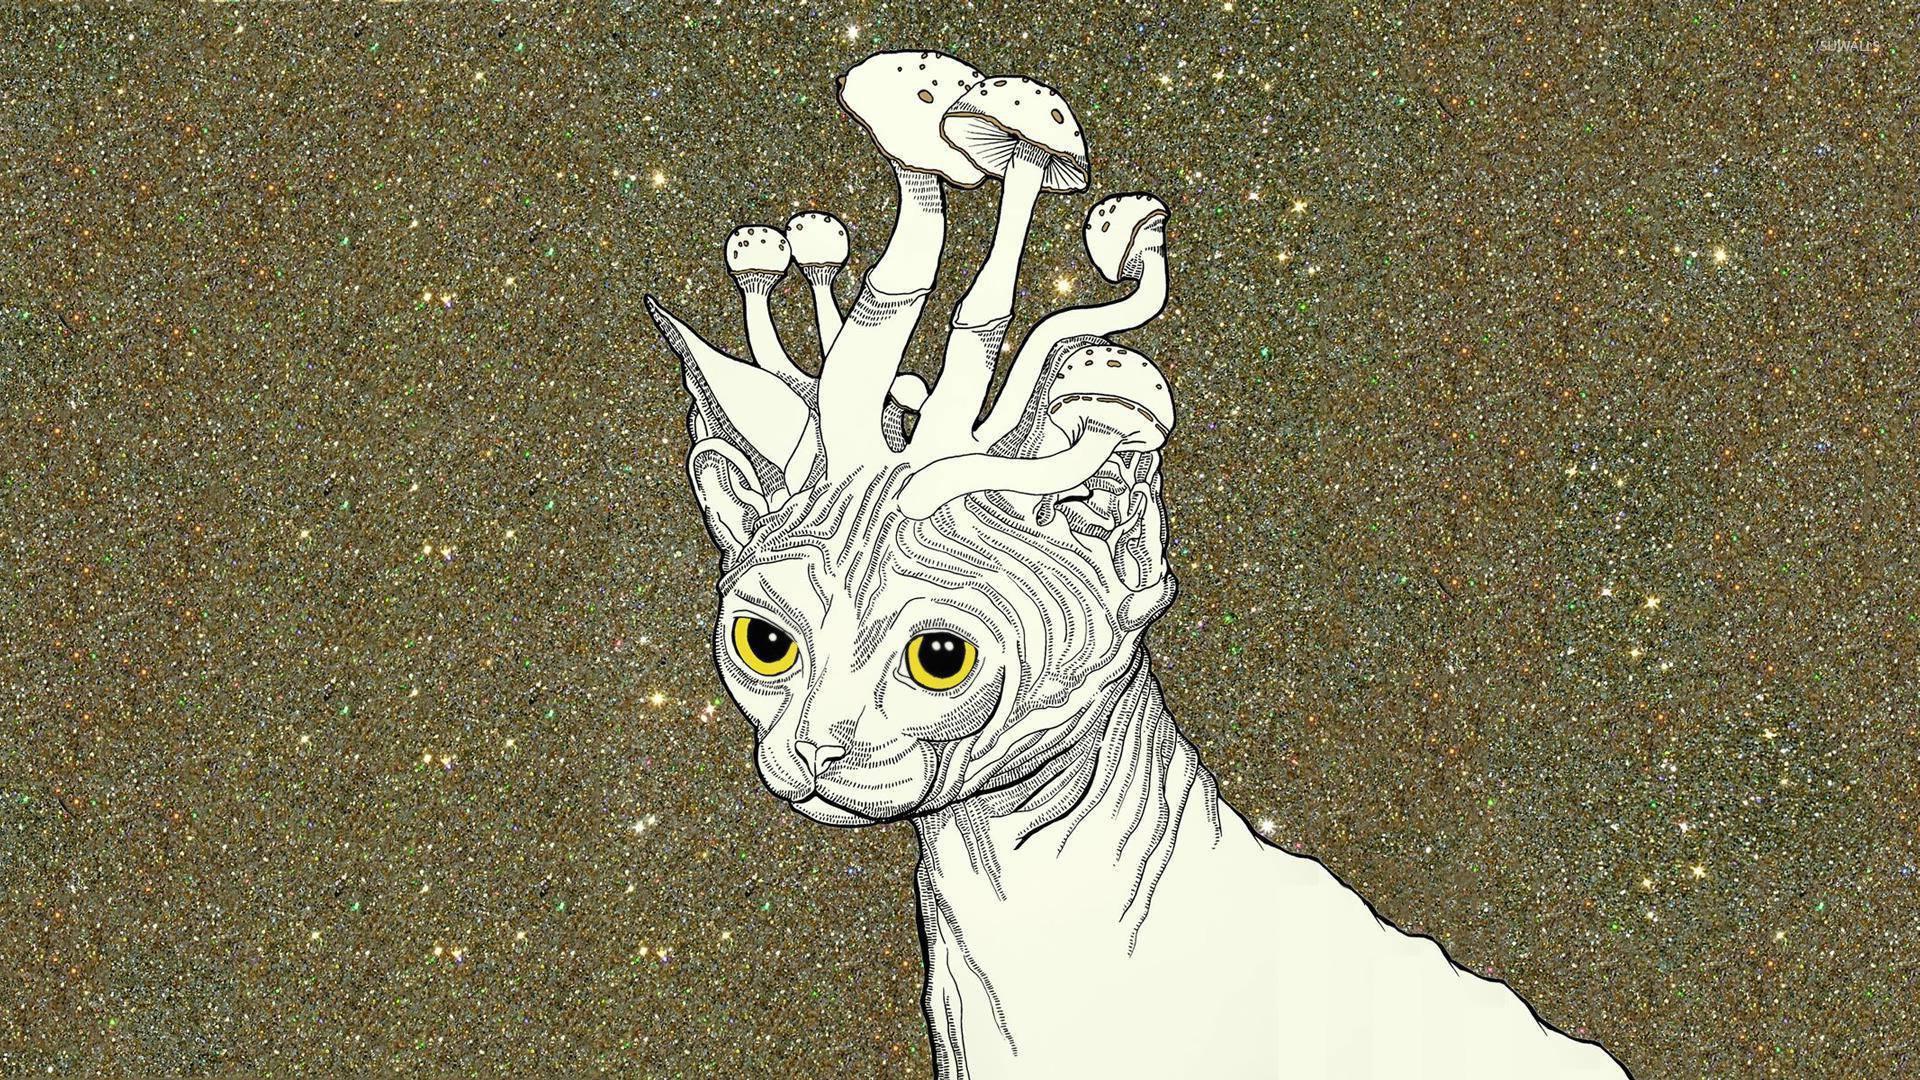 Cute Cartoon Hd Wallpapers Free Download Mushroom Headed Cat Wallpaper Artistic Wallpapers 16091